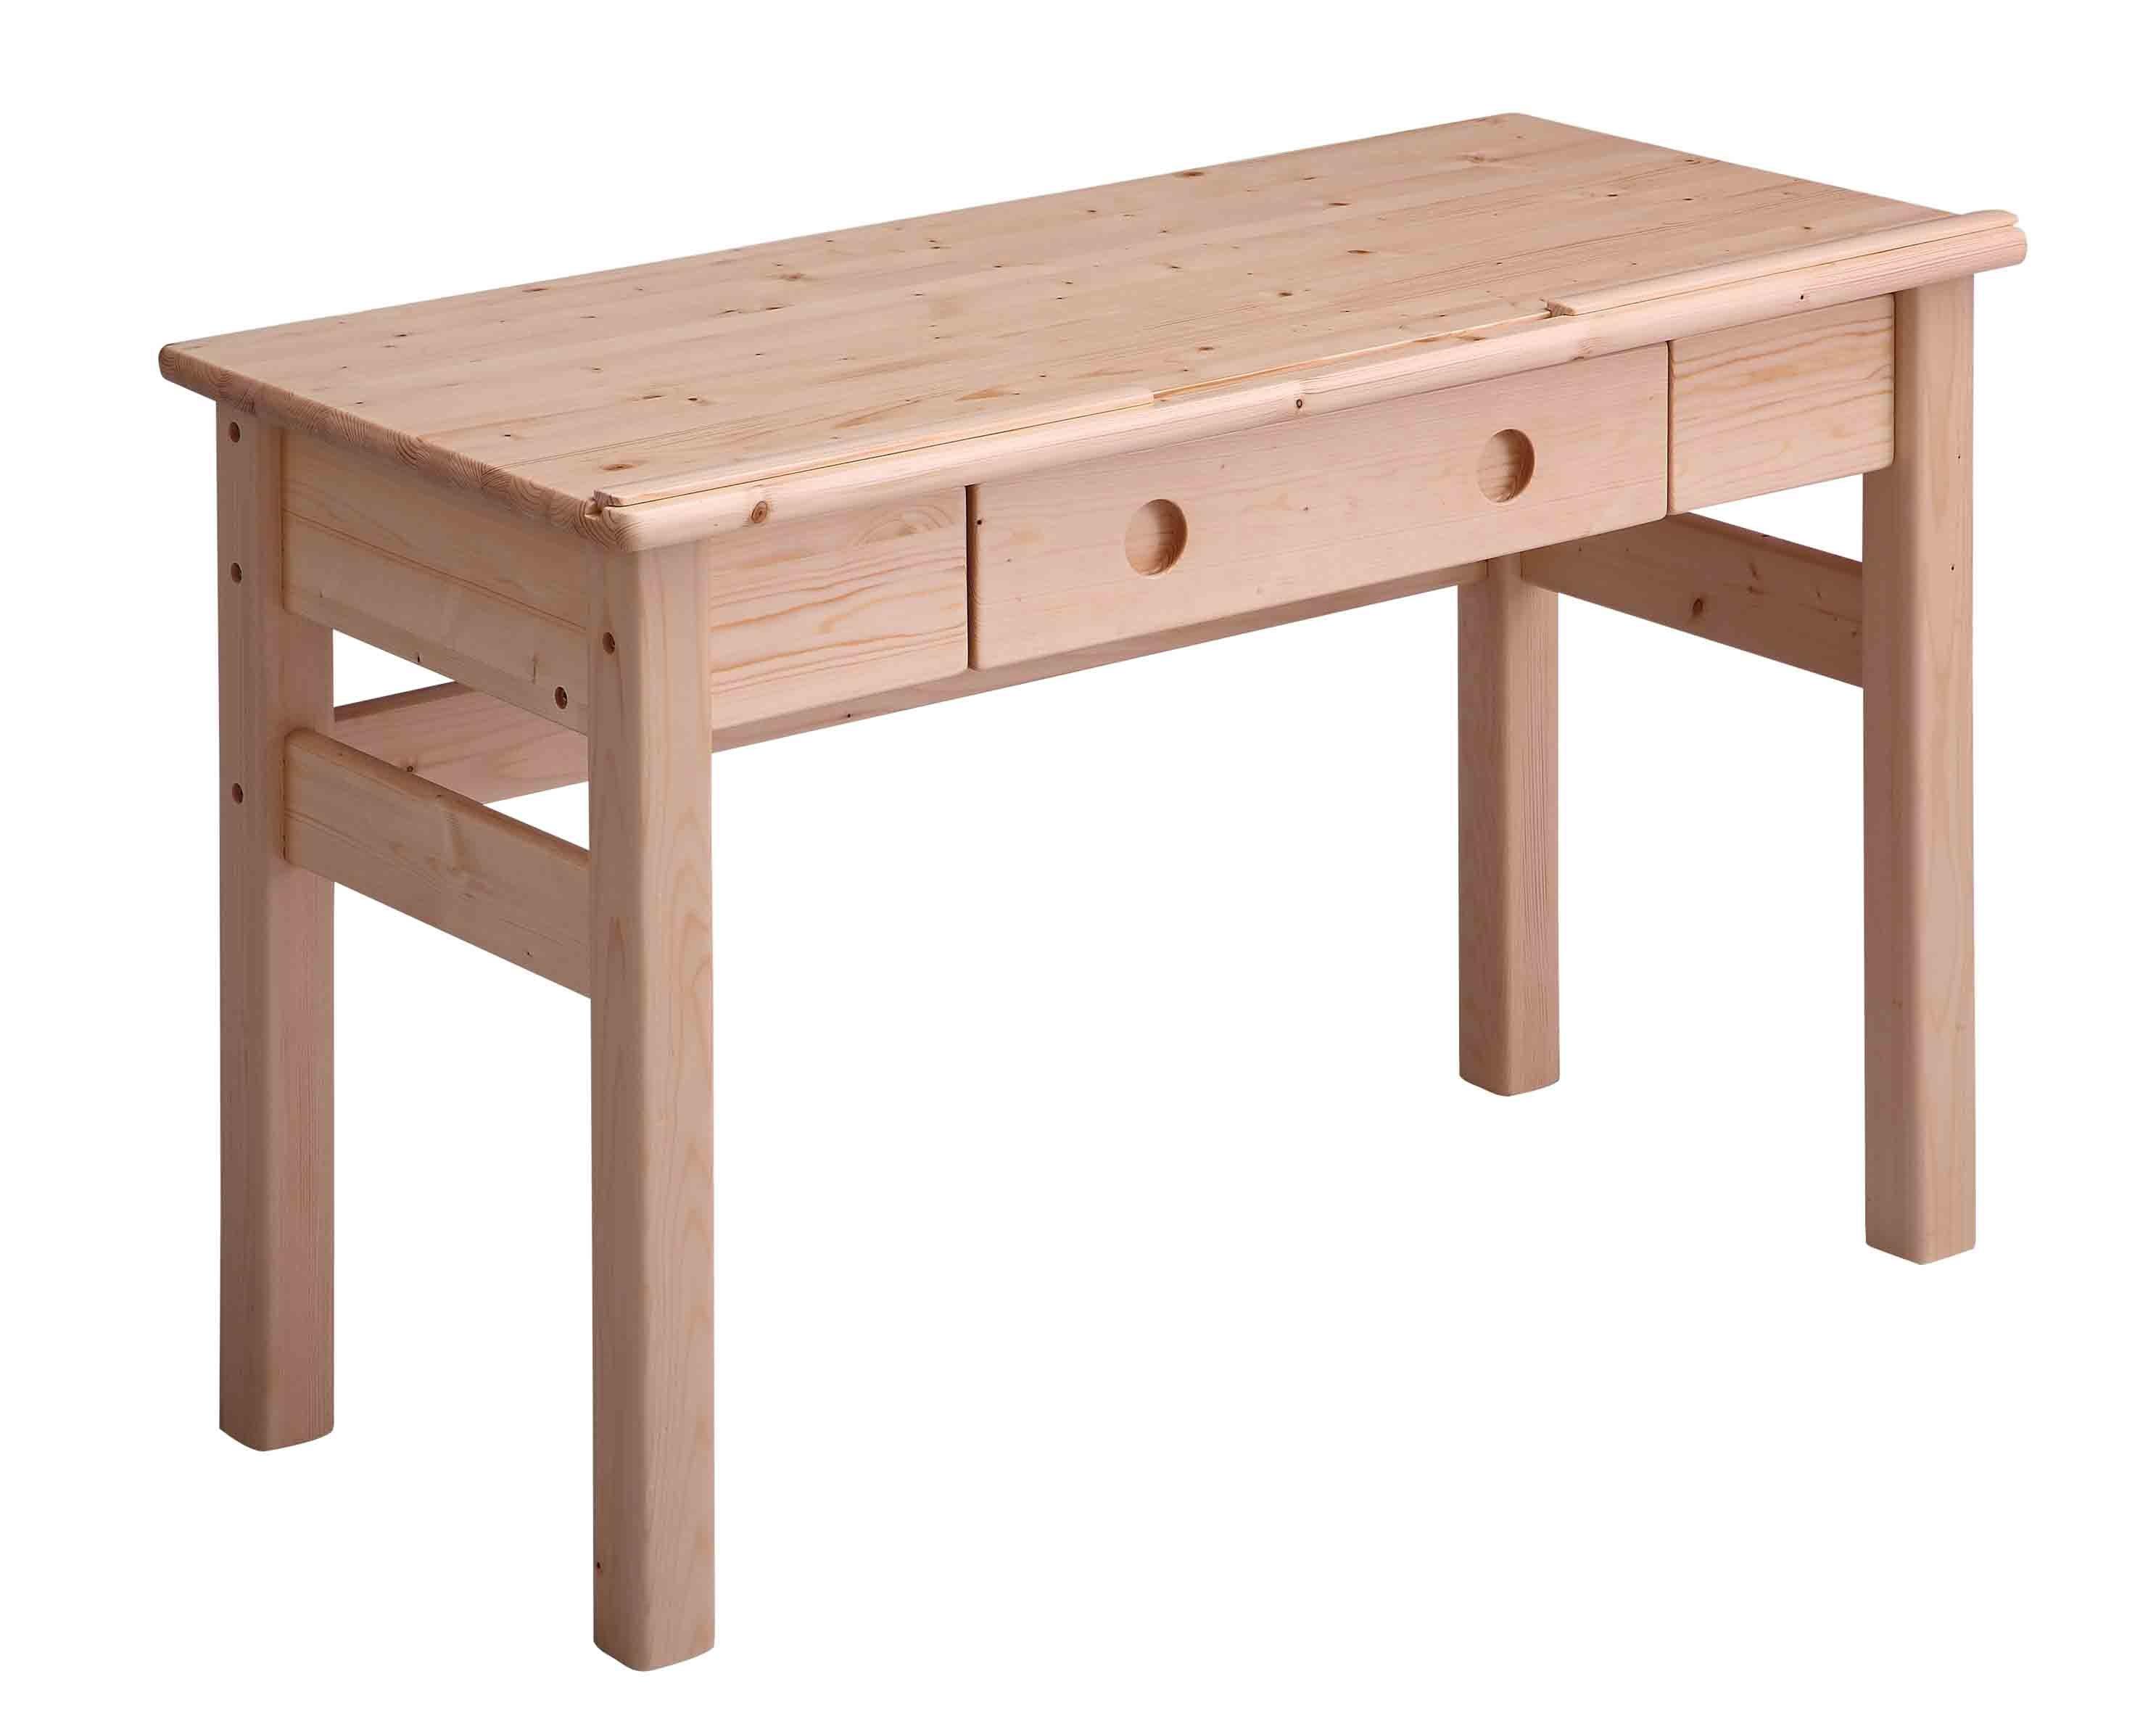 Wooden study table design photograph wood bu